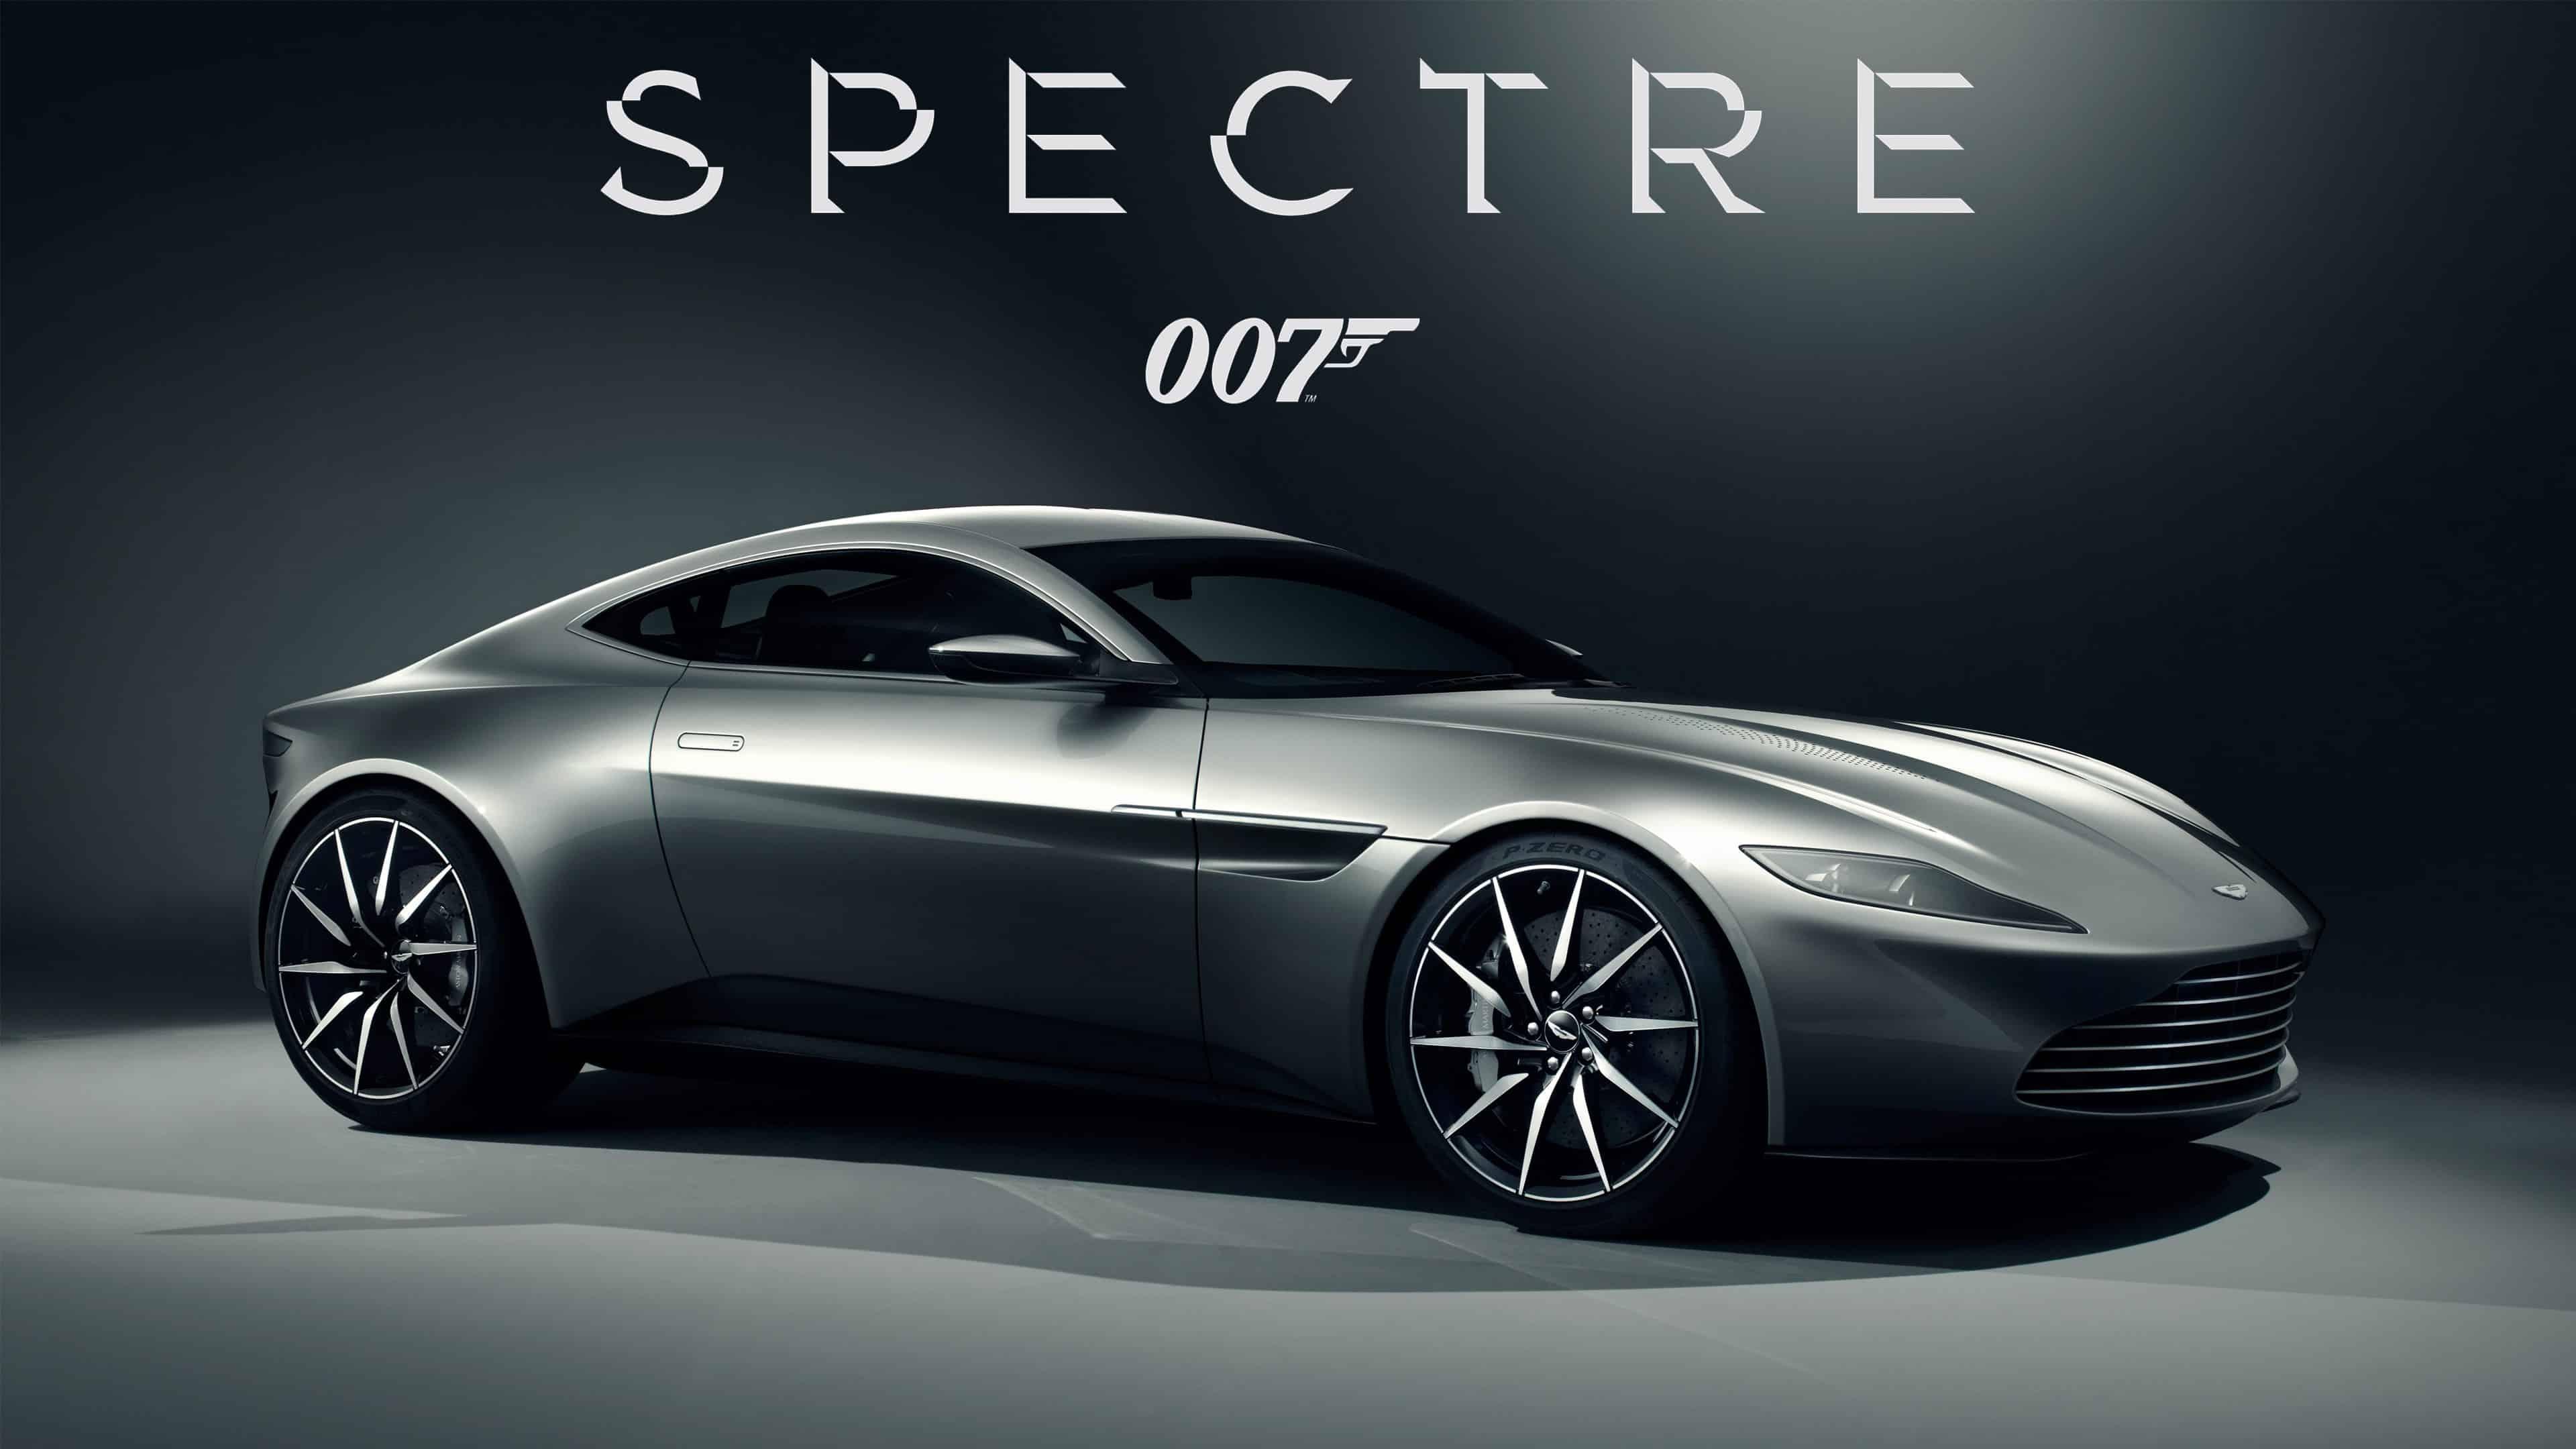 James Bond 4k Wallpapers Top Free James Bond 4k Backgrounds Wallpaperaccess